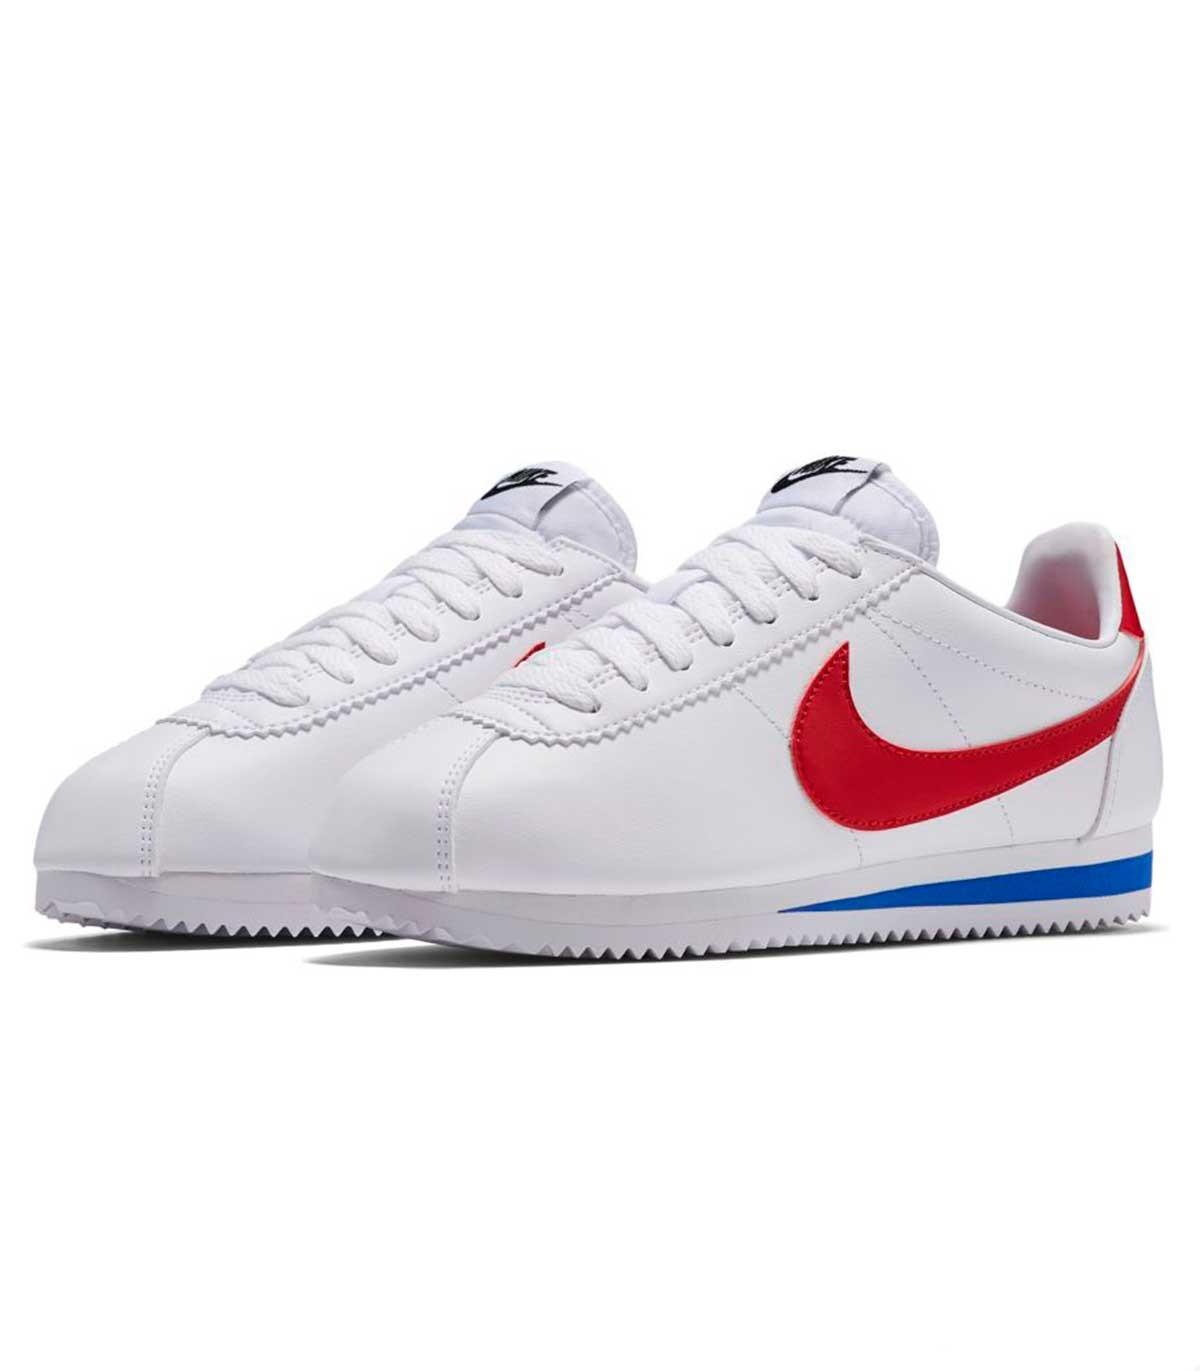 uk availability 06521 e693a Zapatillas Nike Cortez Leather | Comprar Online